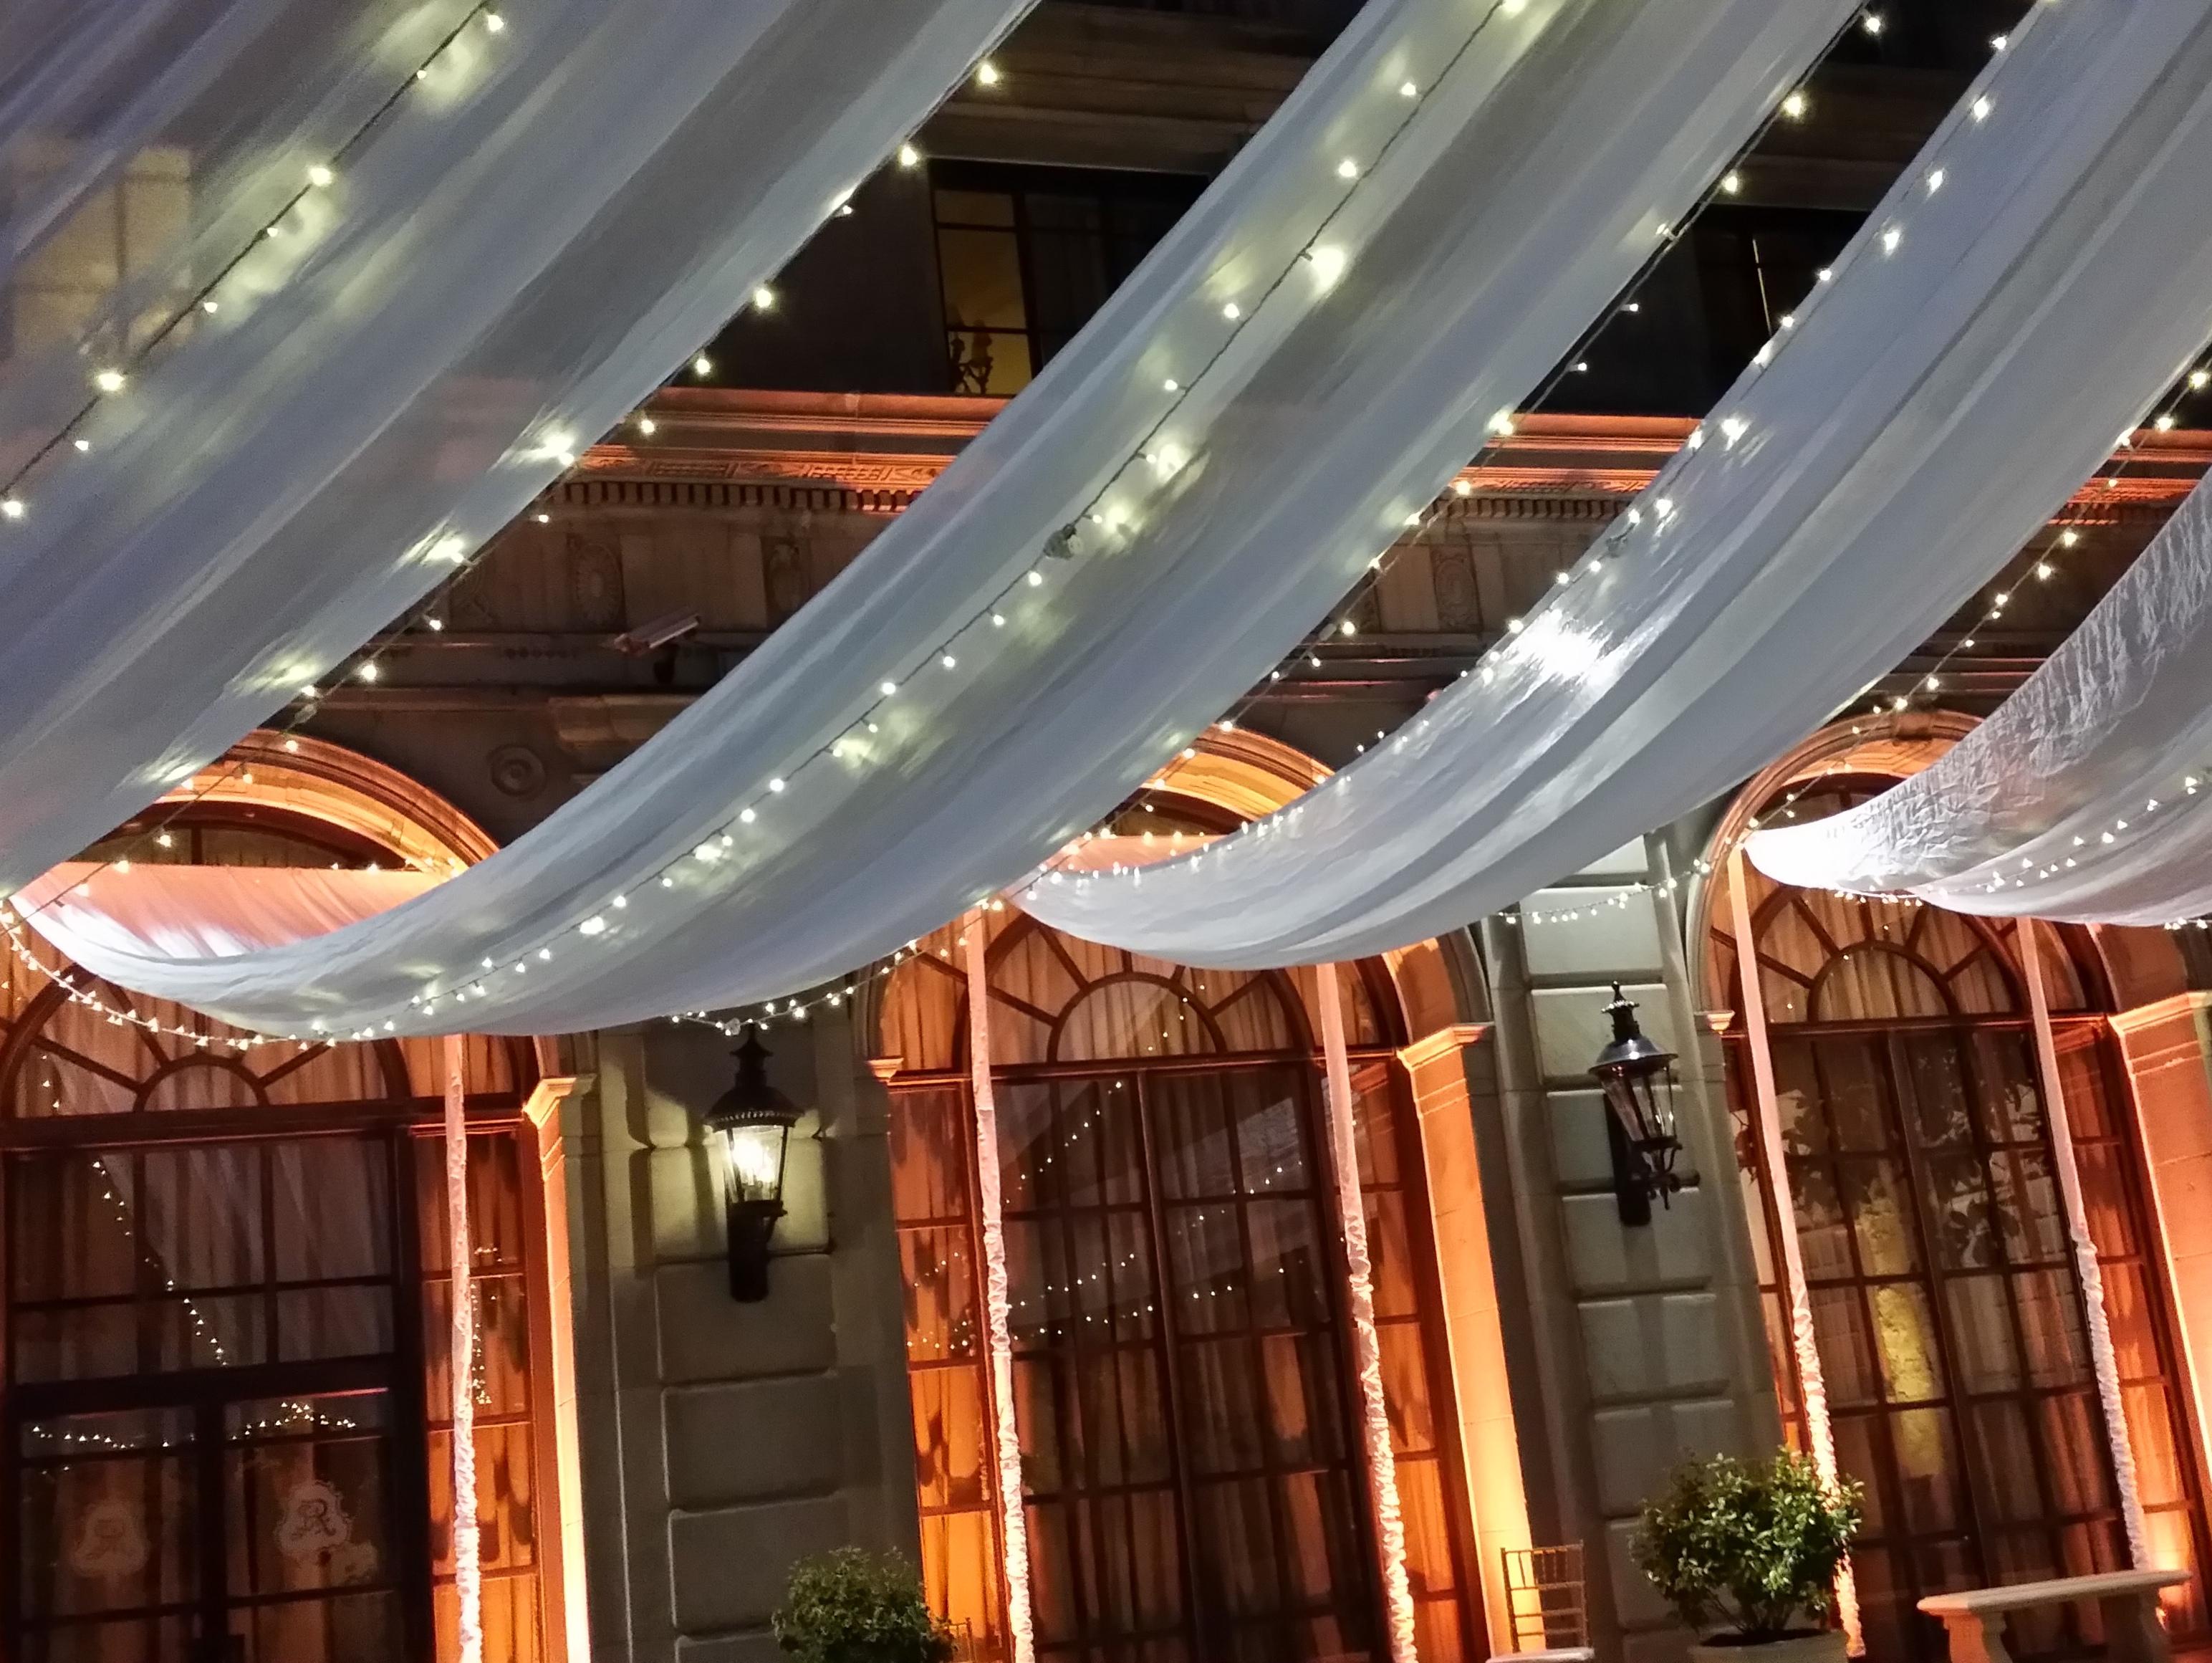 St Regis Washington D C Wedding B Lights Ceiling Swags